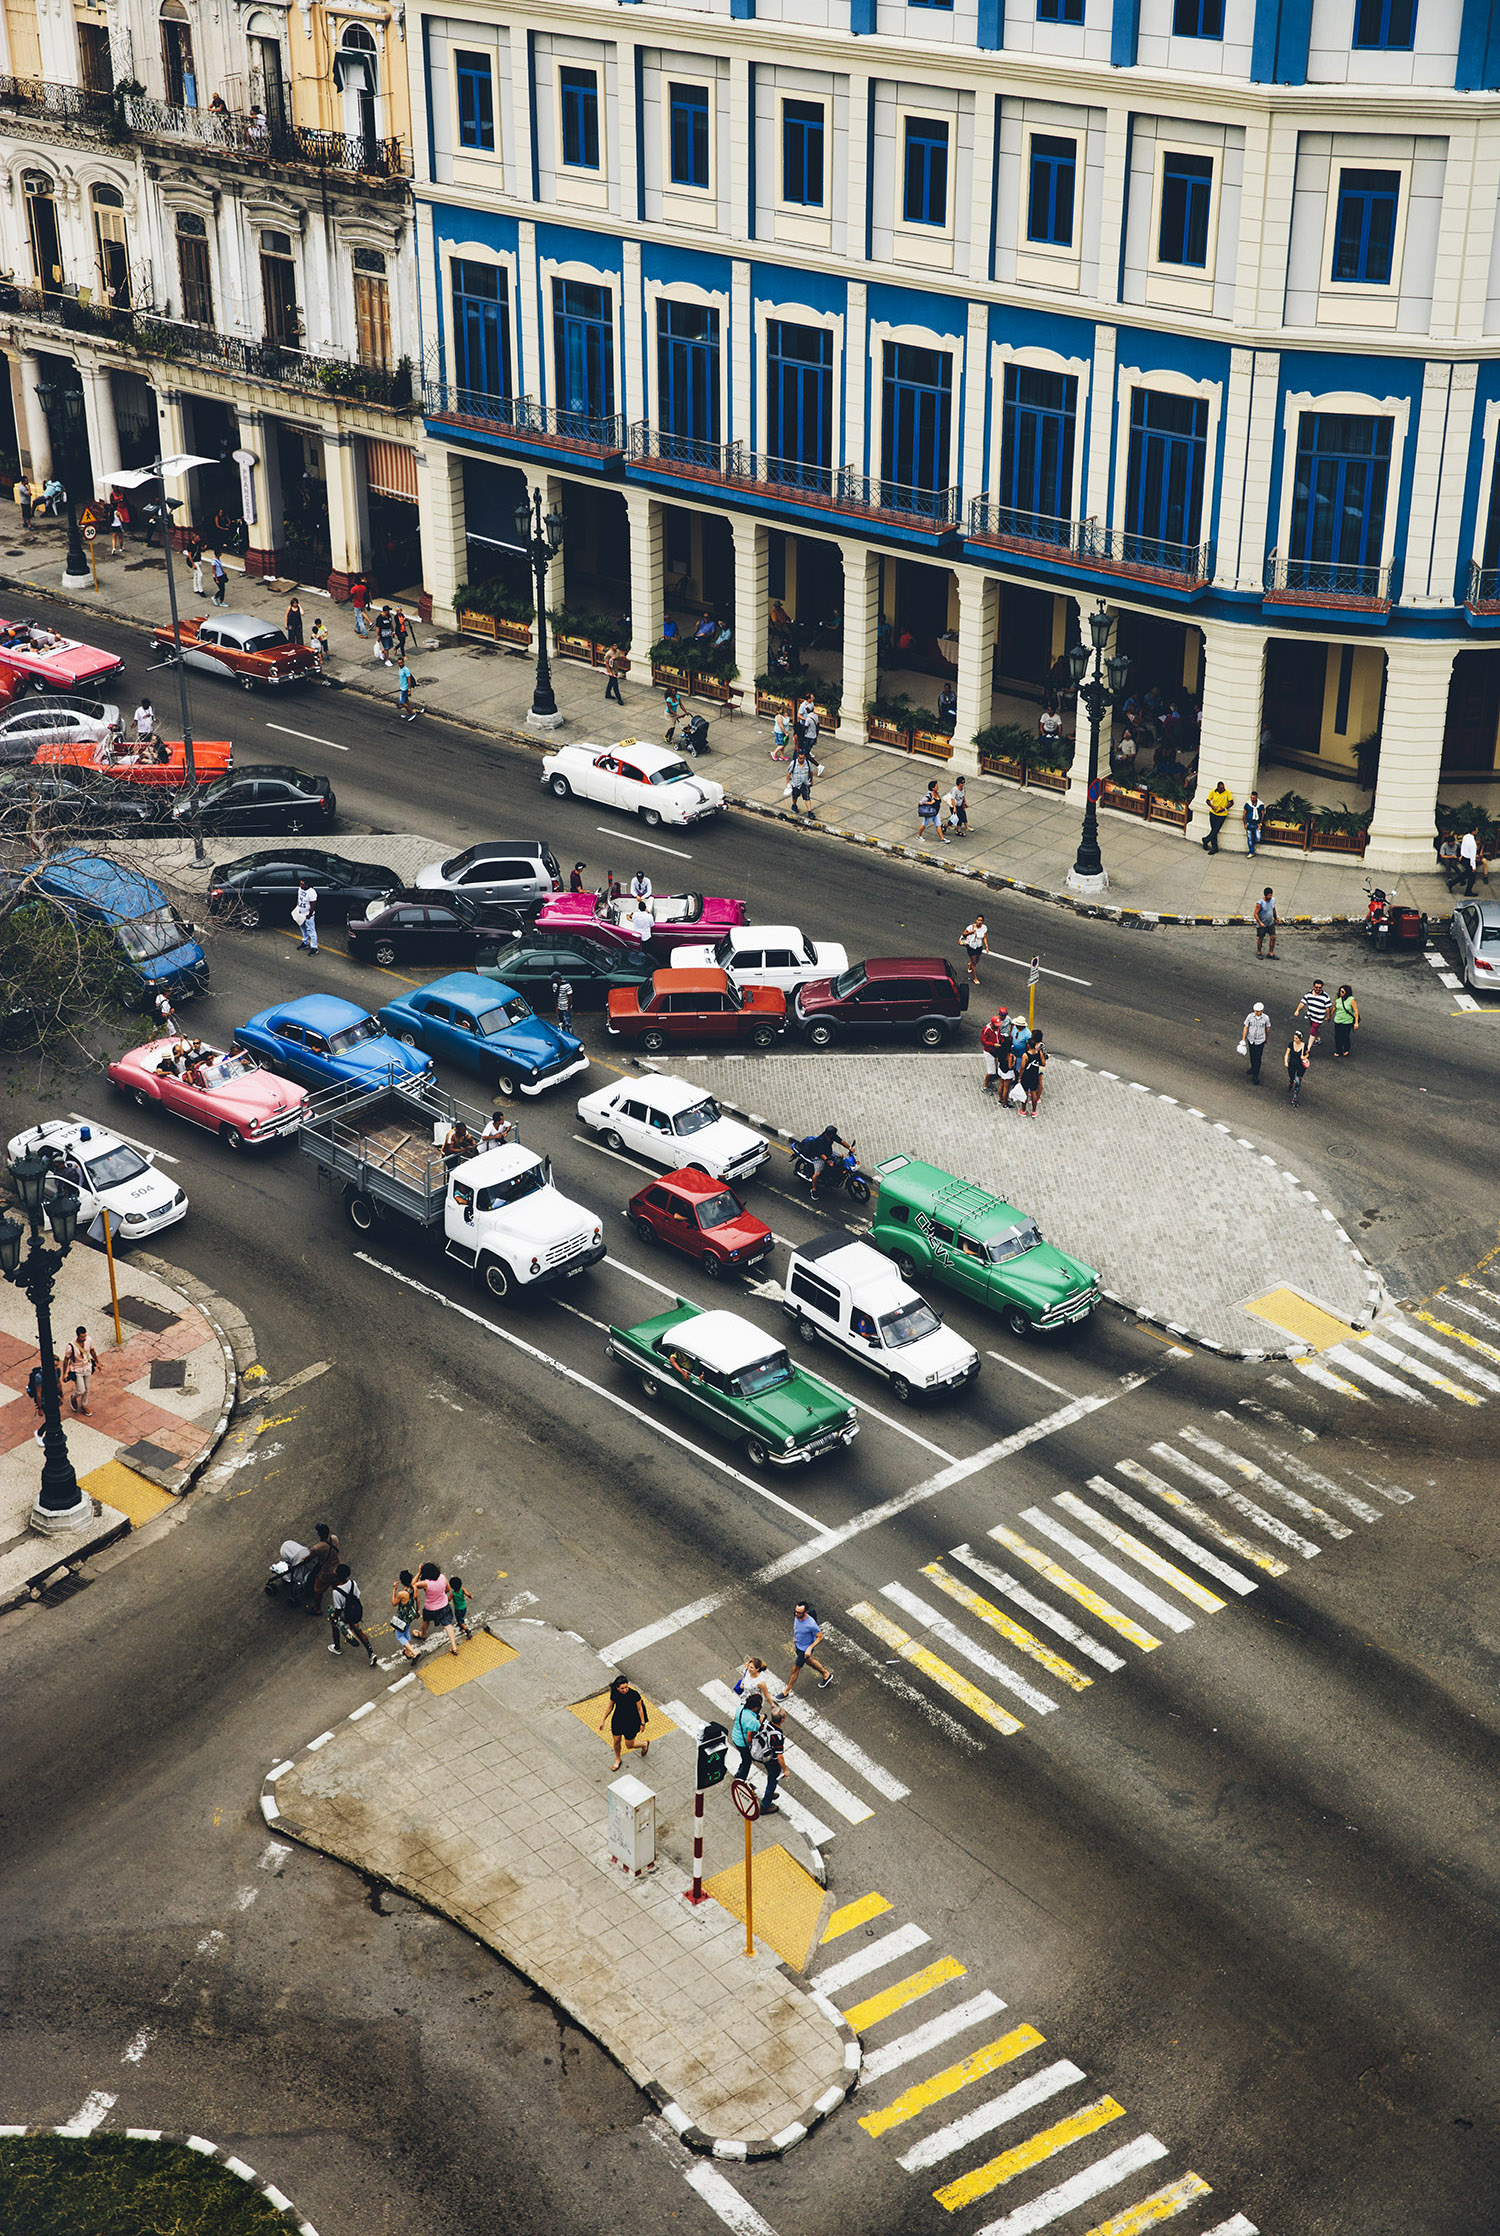 030_Cuba_-1599_V1_final.jpg